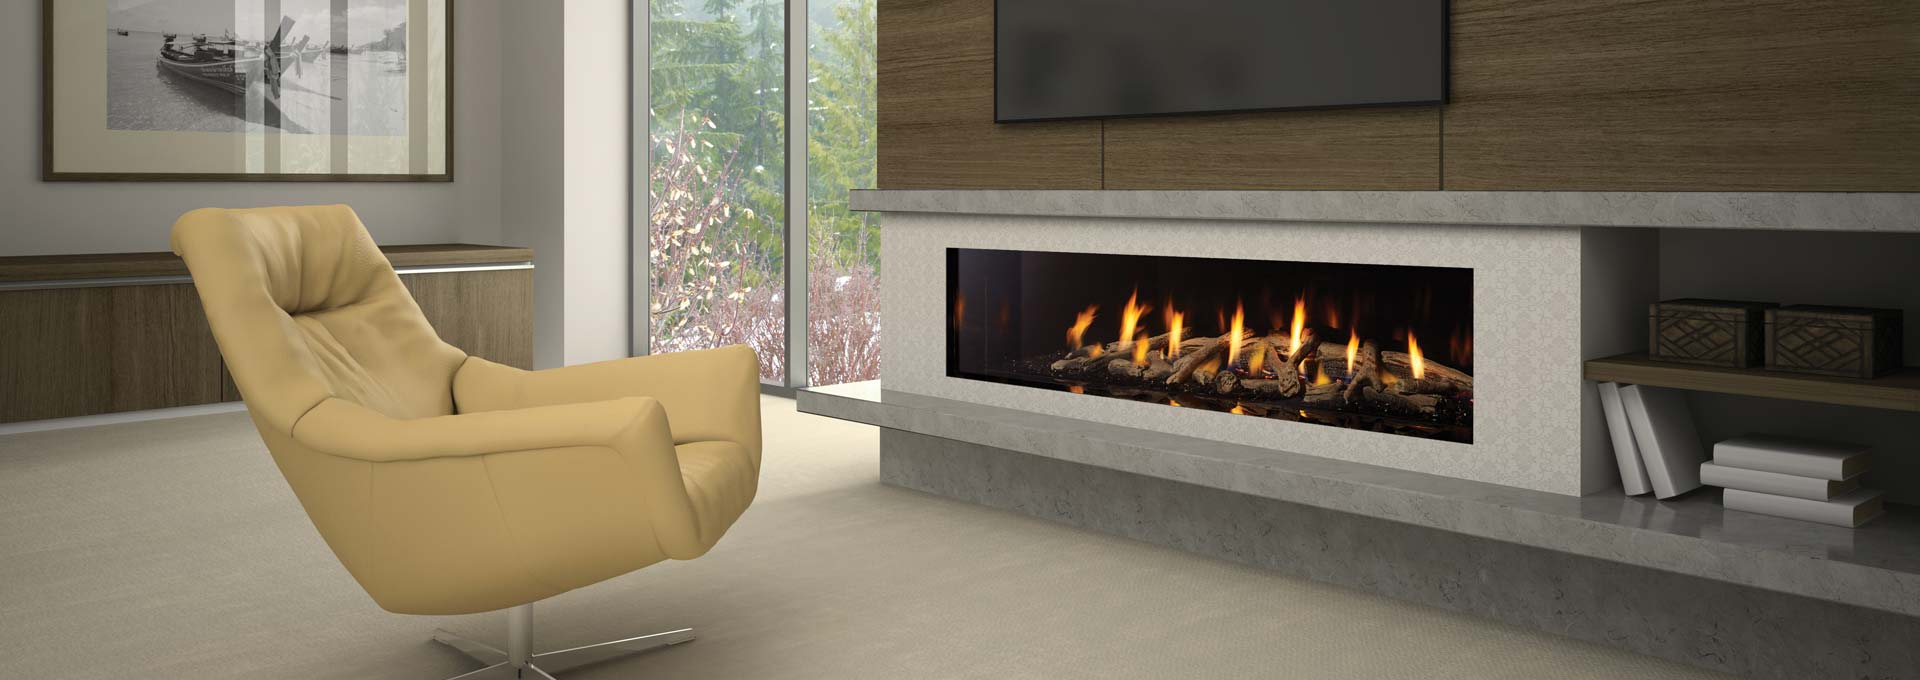 New York 72 Designer Gas Fireplace Regency